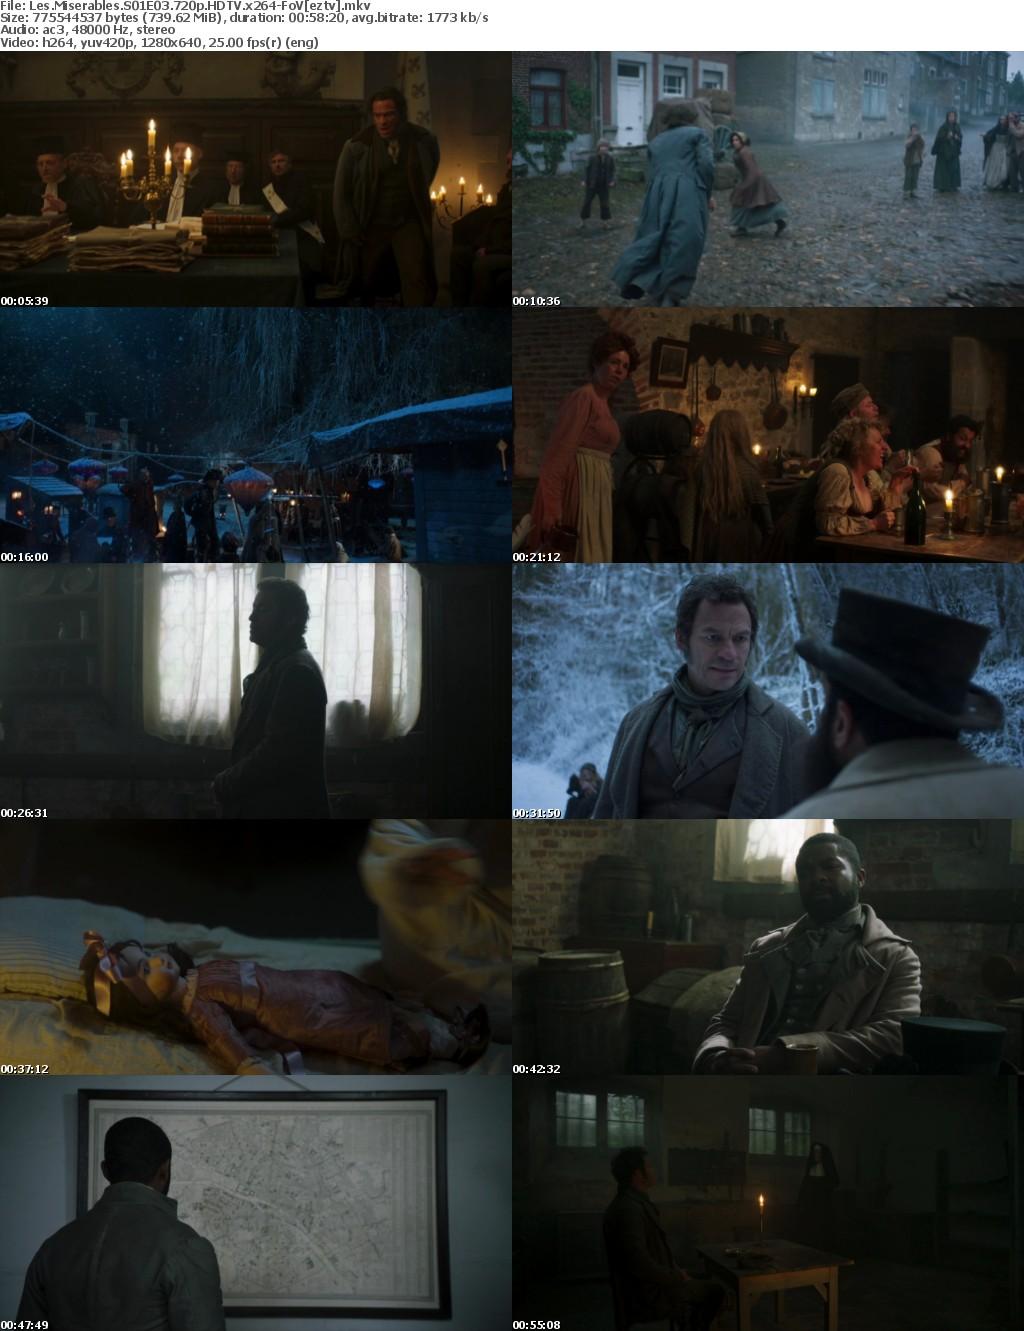 Les Miserables S01E03 720p HDTV x264-FoV